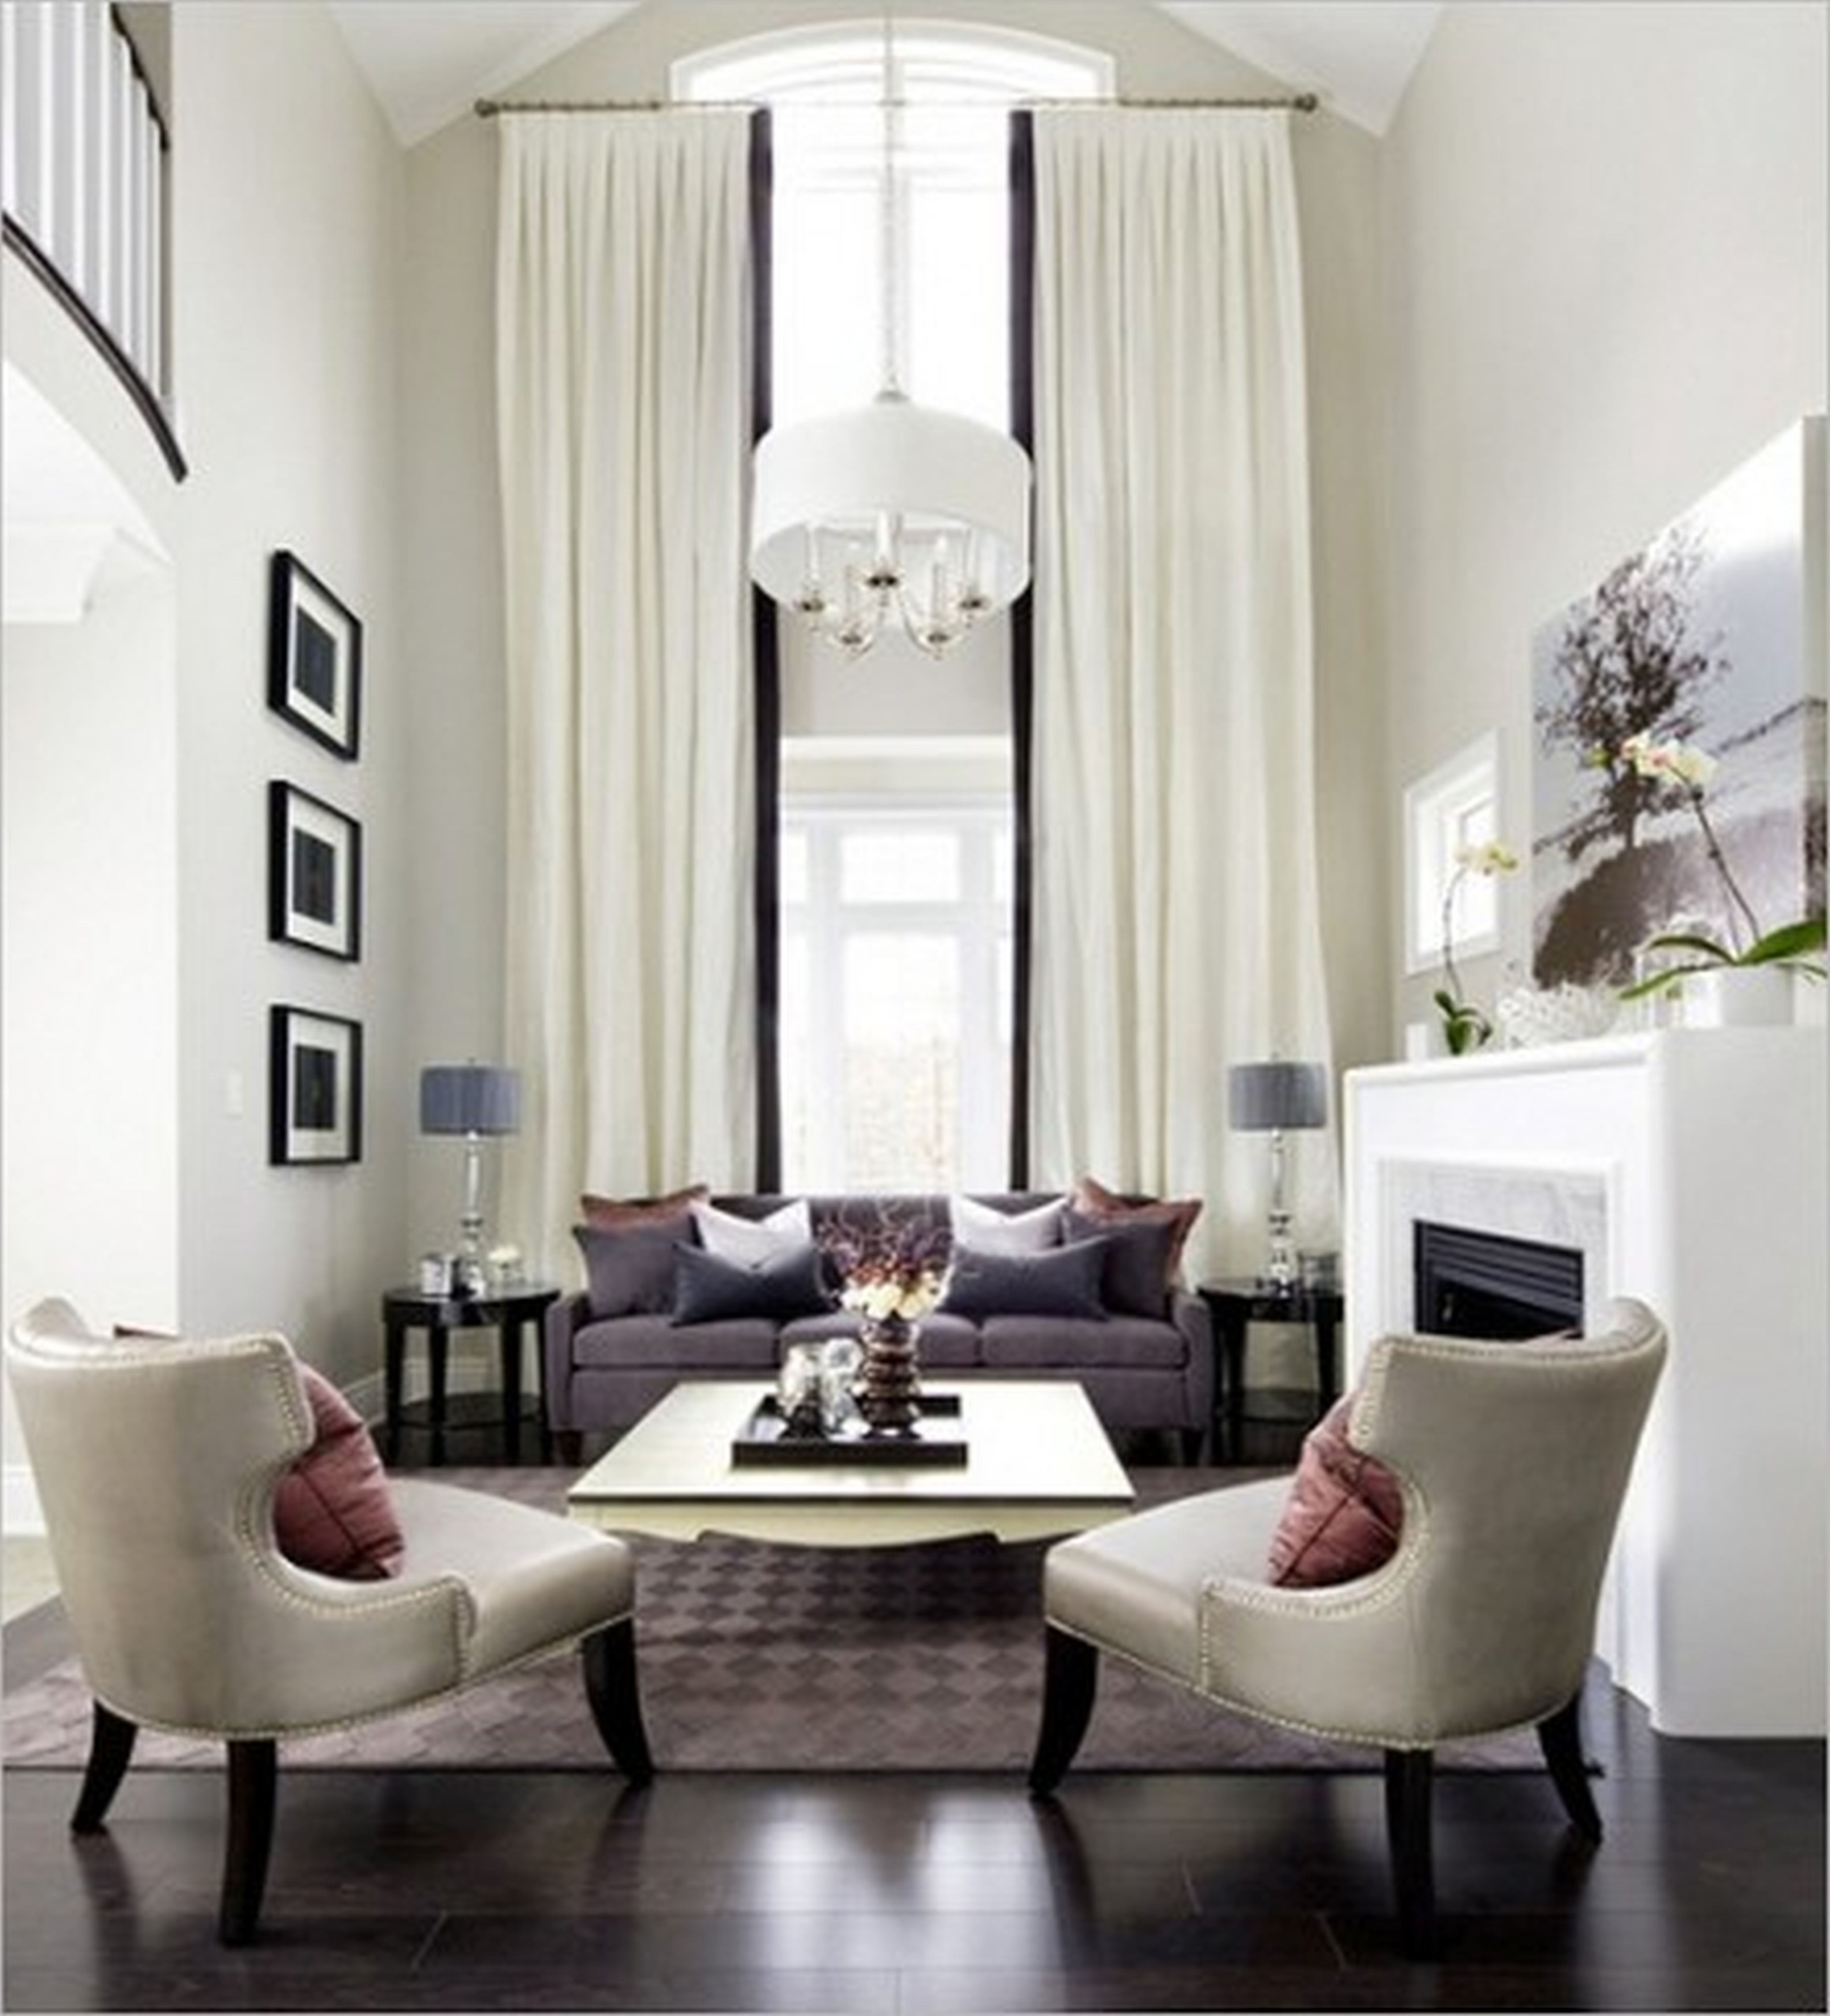 Modern Rustic Living Room Rustic Living Room Ideas Modern Rustic Living Room Furniture